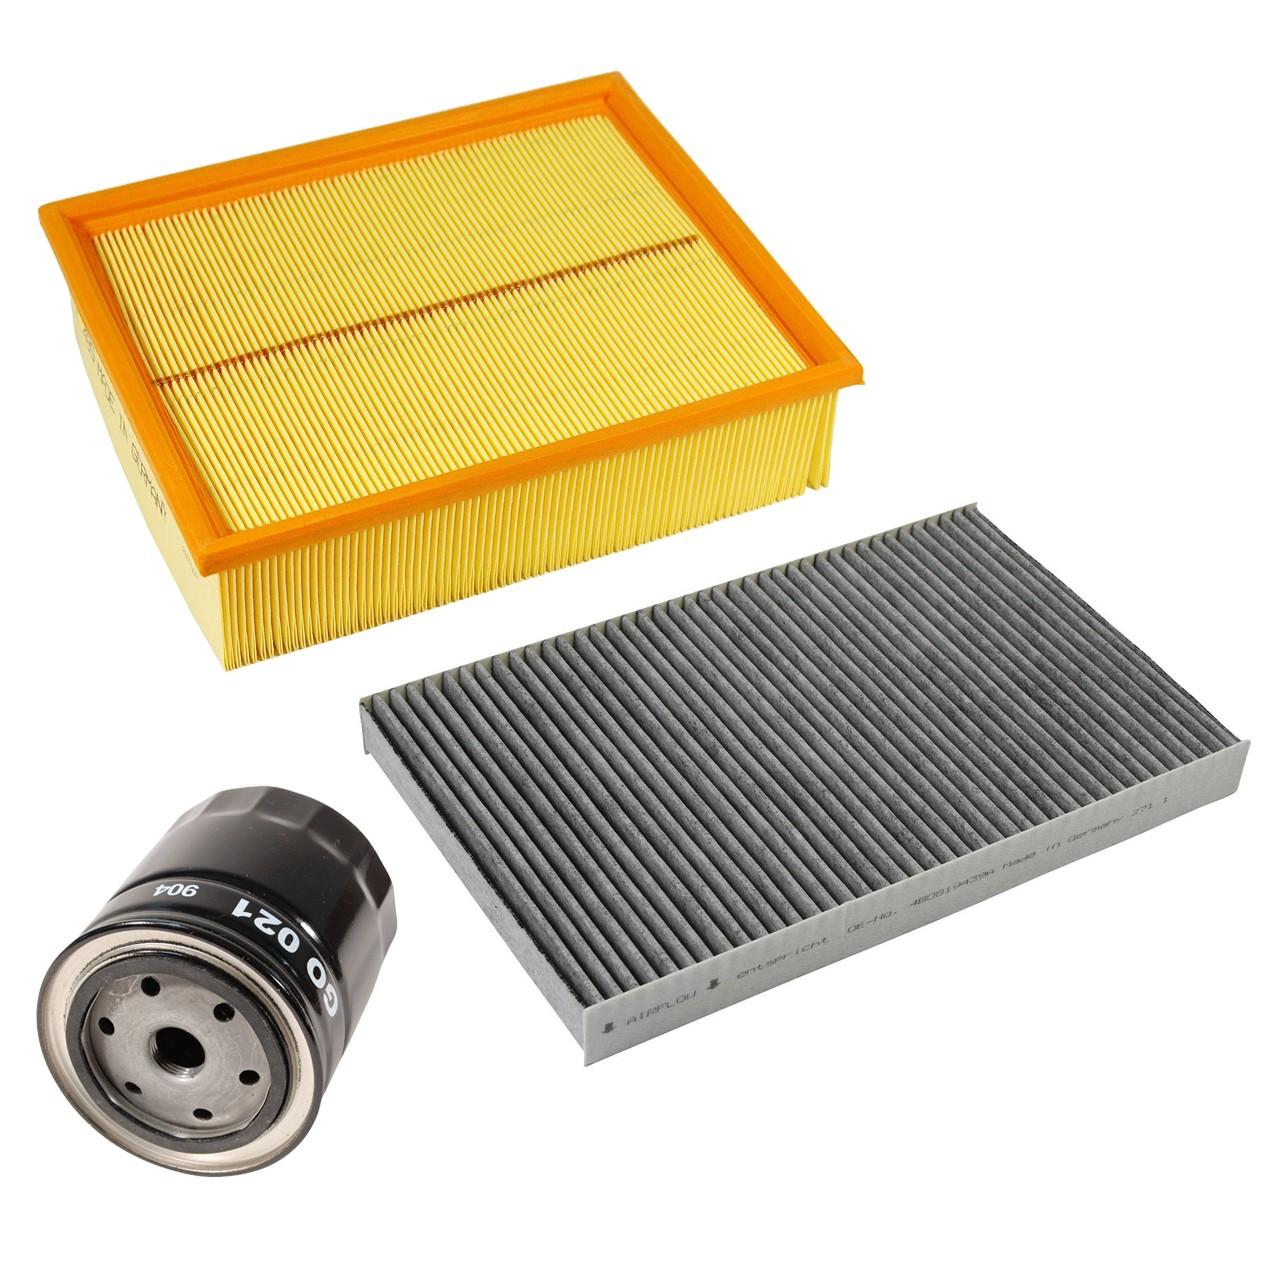 Inspektionskit Filterpaket Filterset für Audi A4 (8E B6 B7) 2.4 3.0 163-220 PS